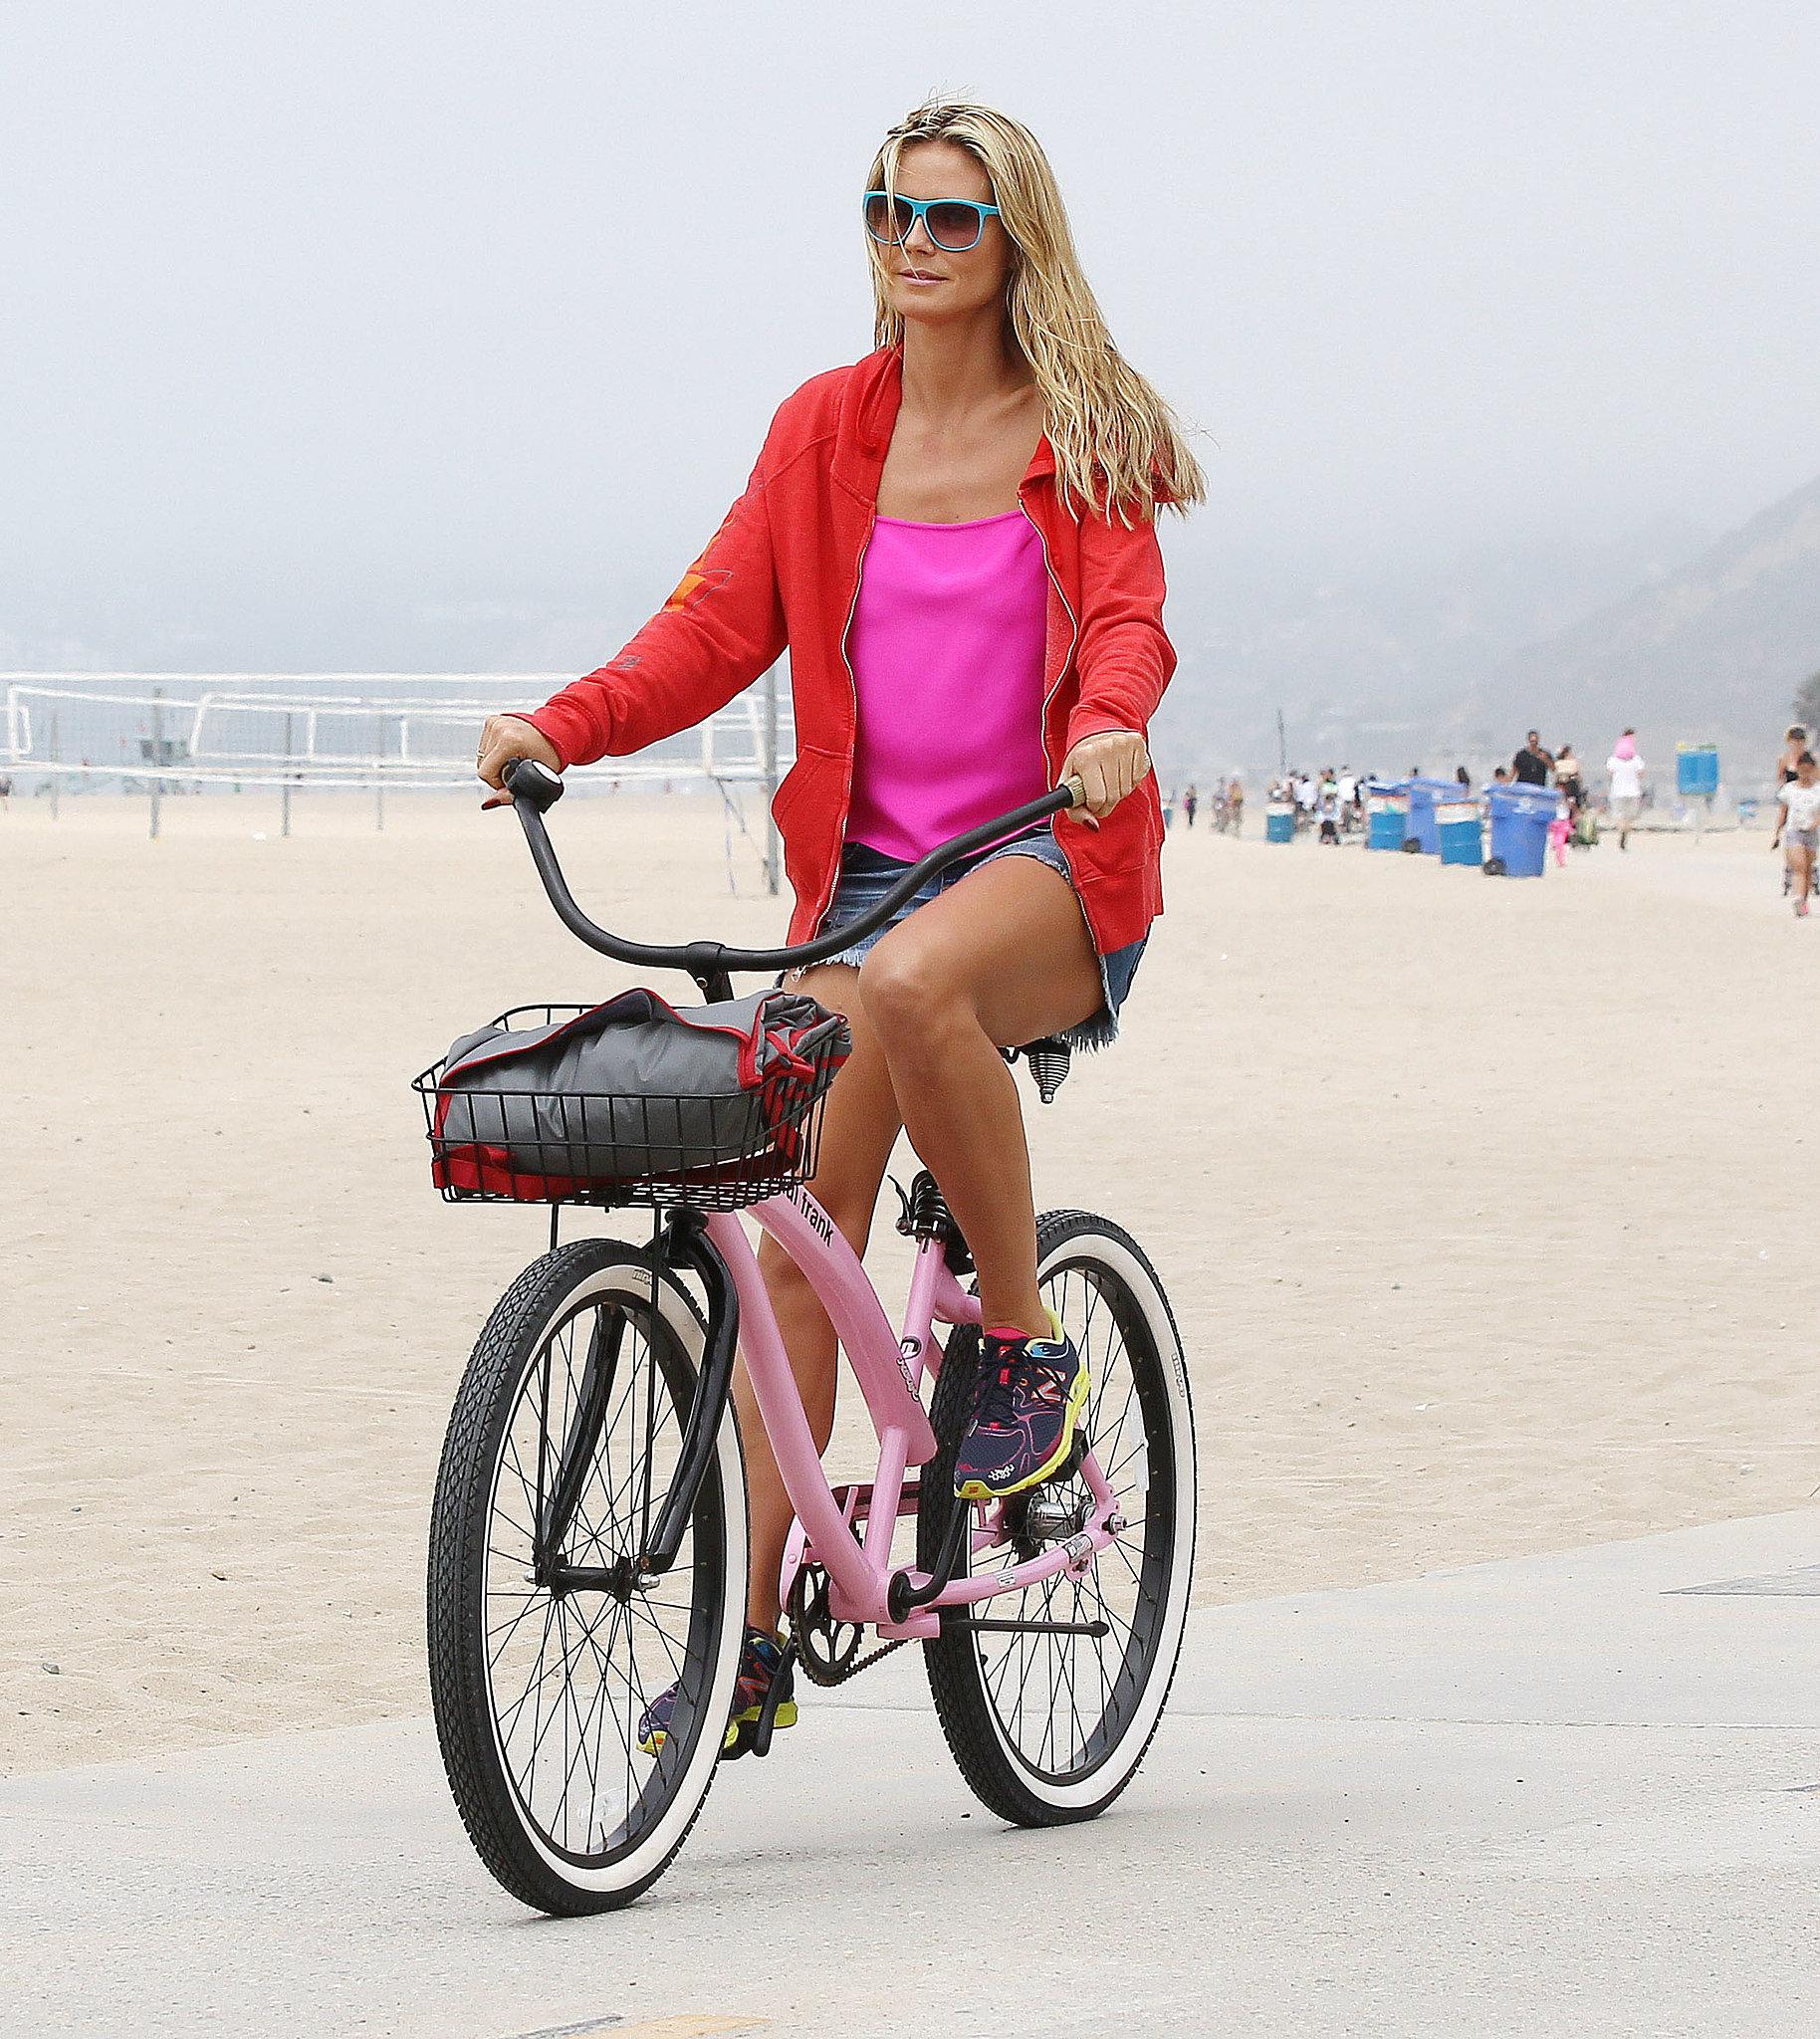 In August, Heidi Klum hit up the beach in LA on a bike.